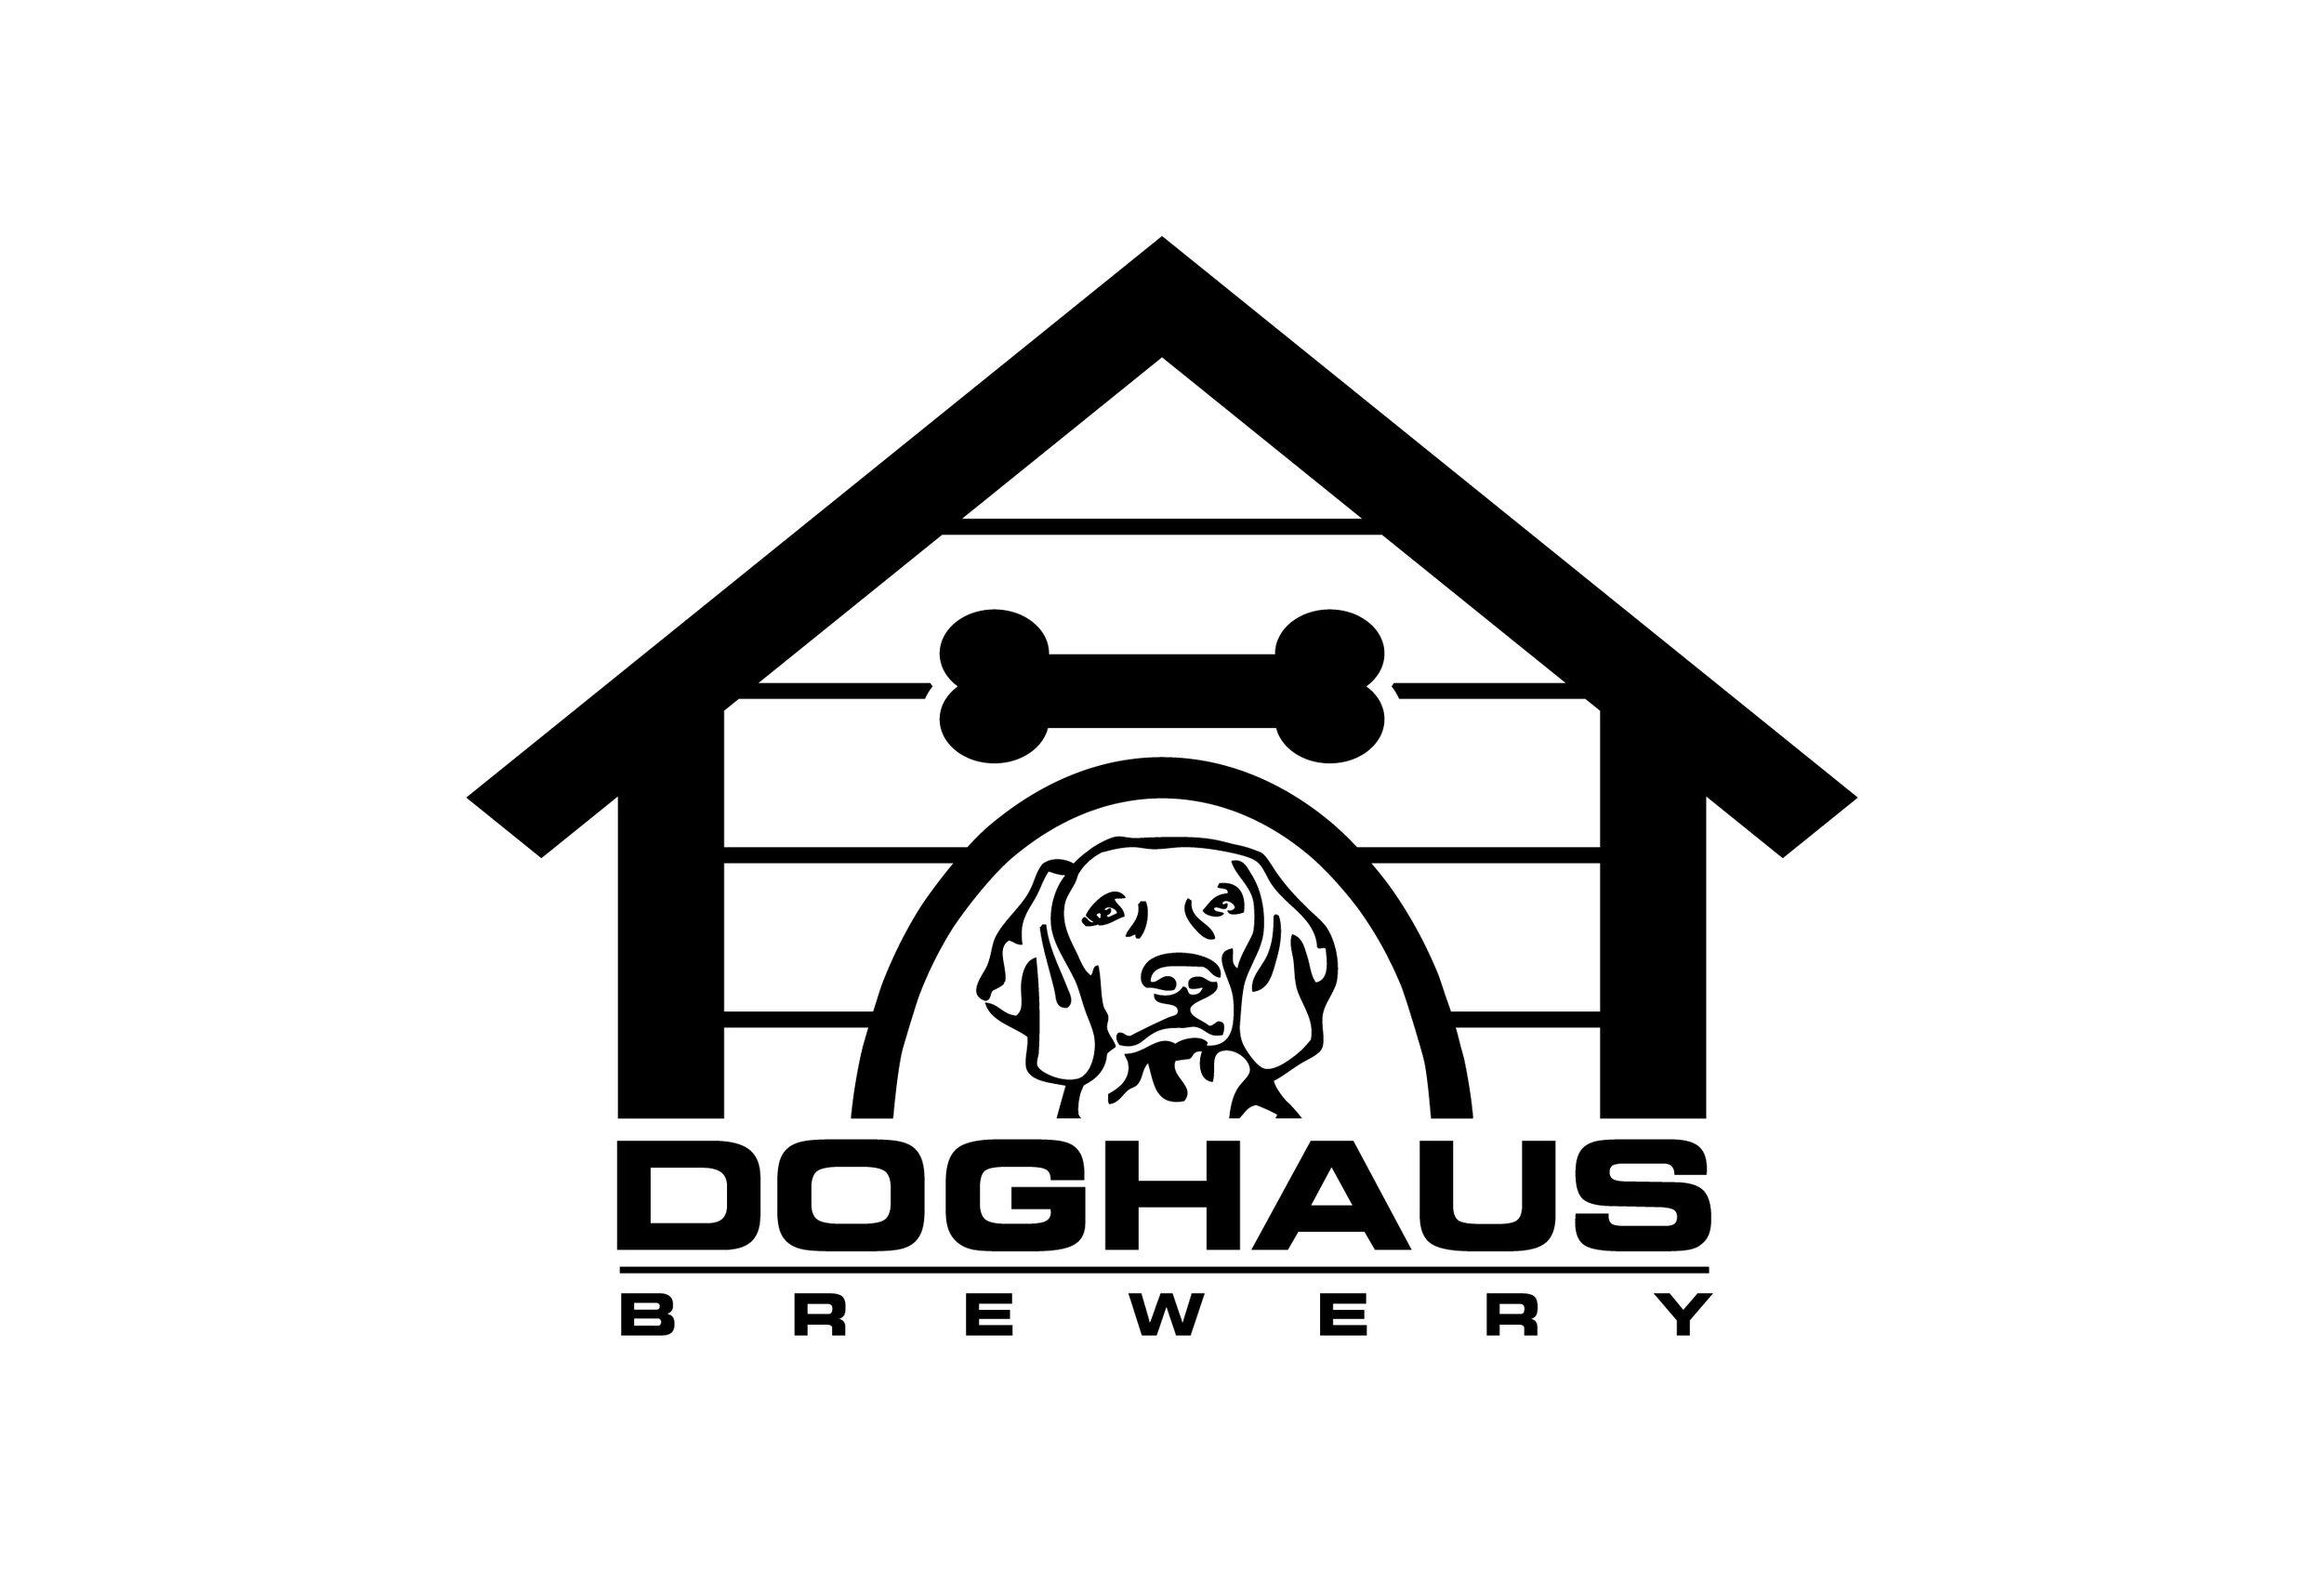 DogHaus Brewing